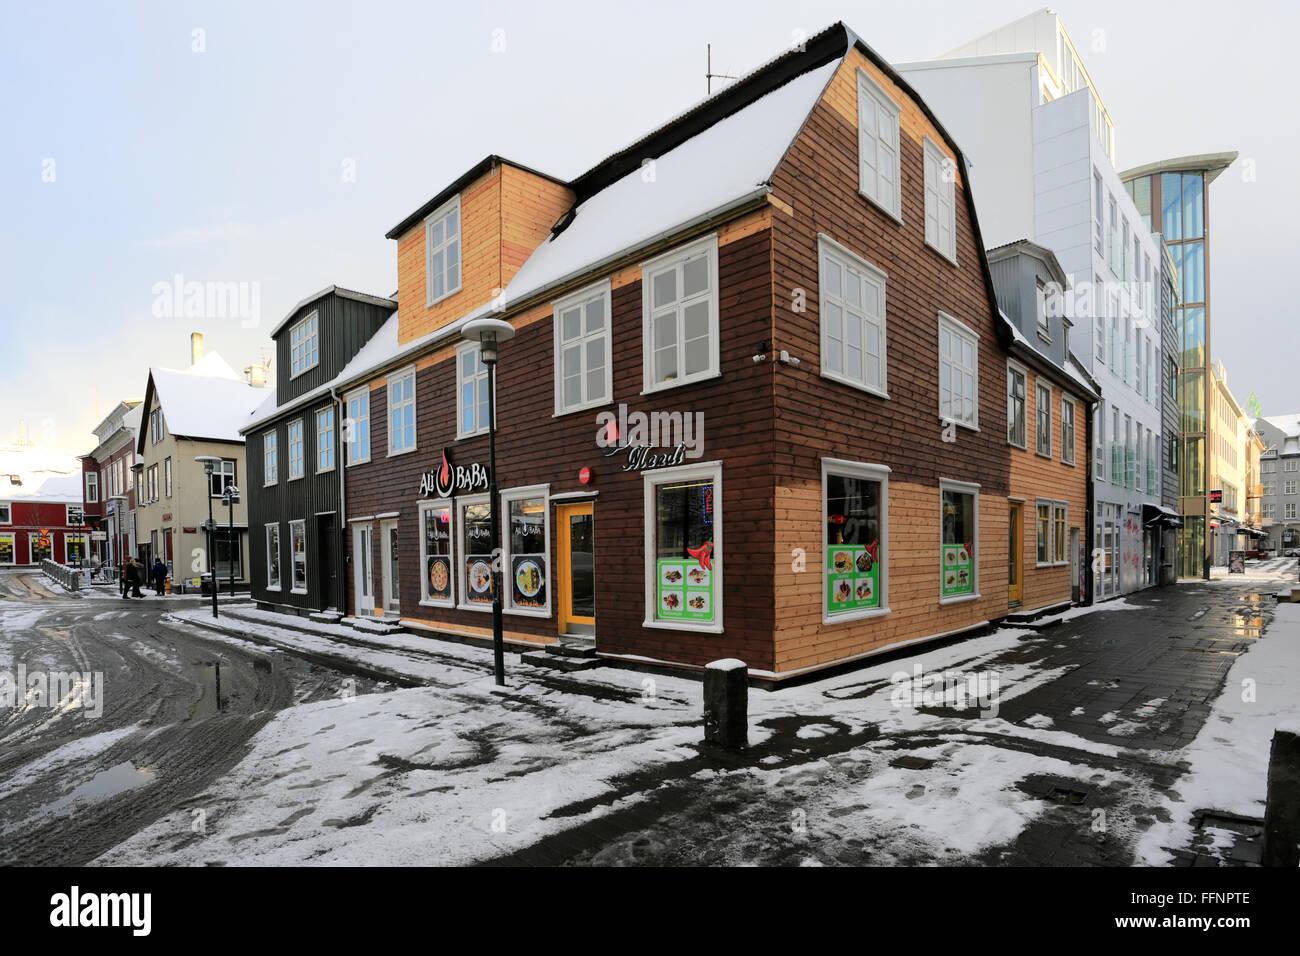 City centre streets view, Reykjavik city, Iceland. - Stock Image